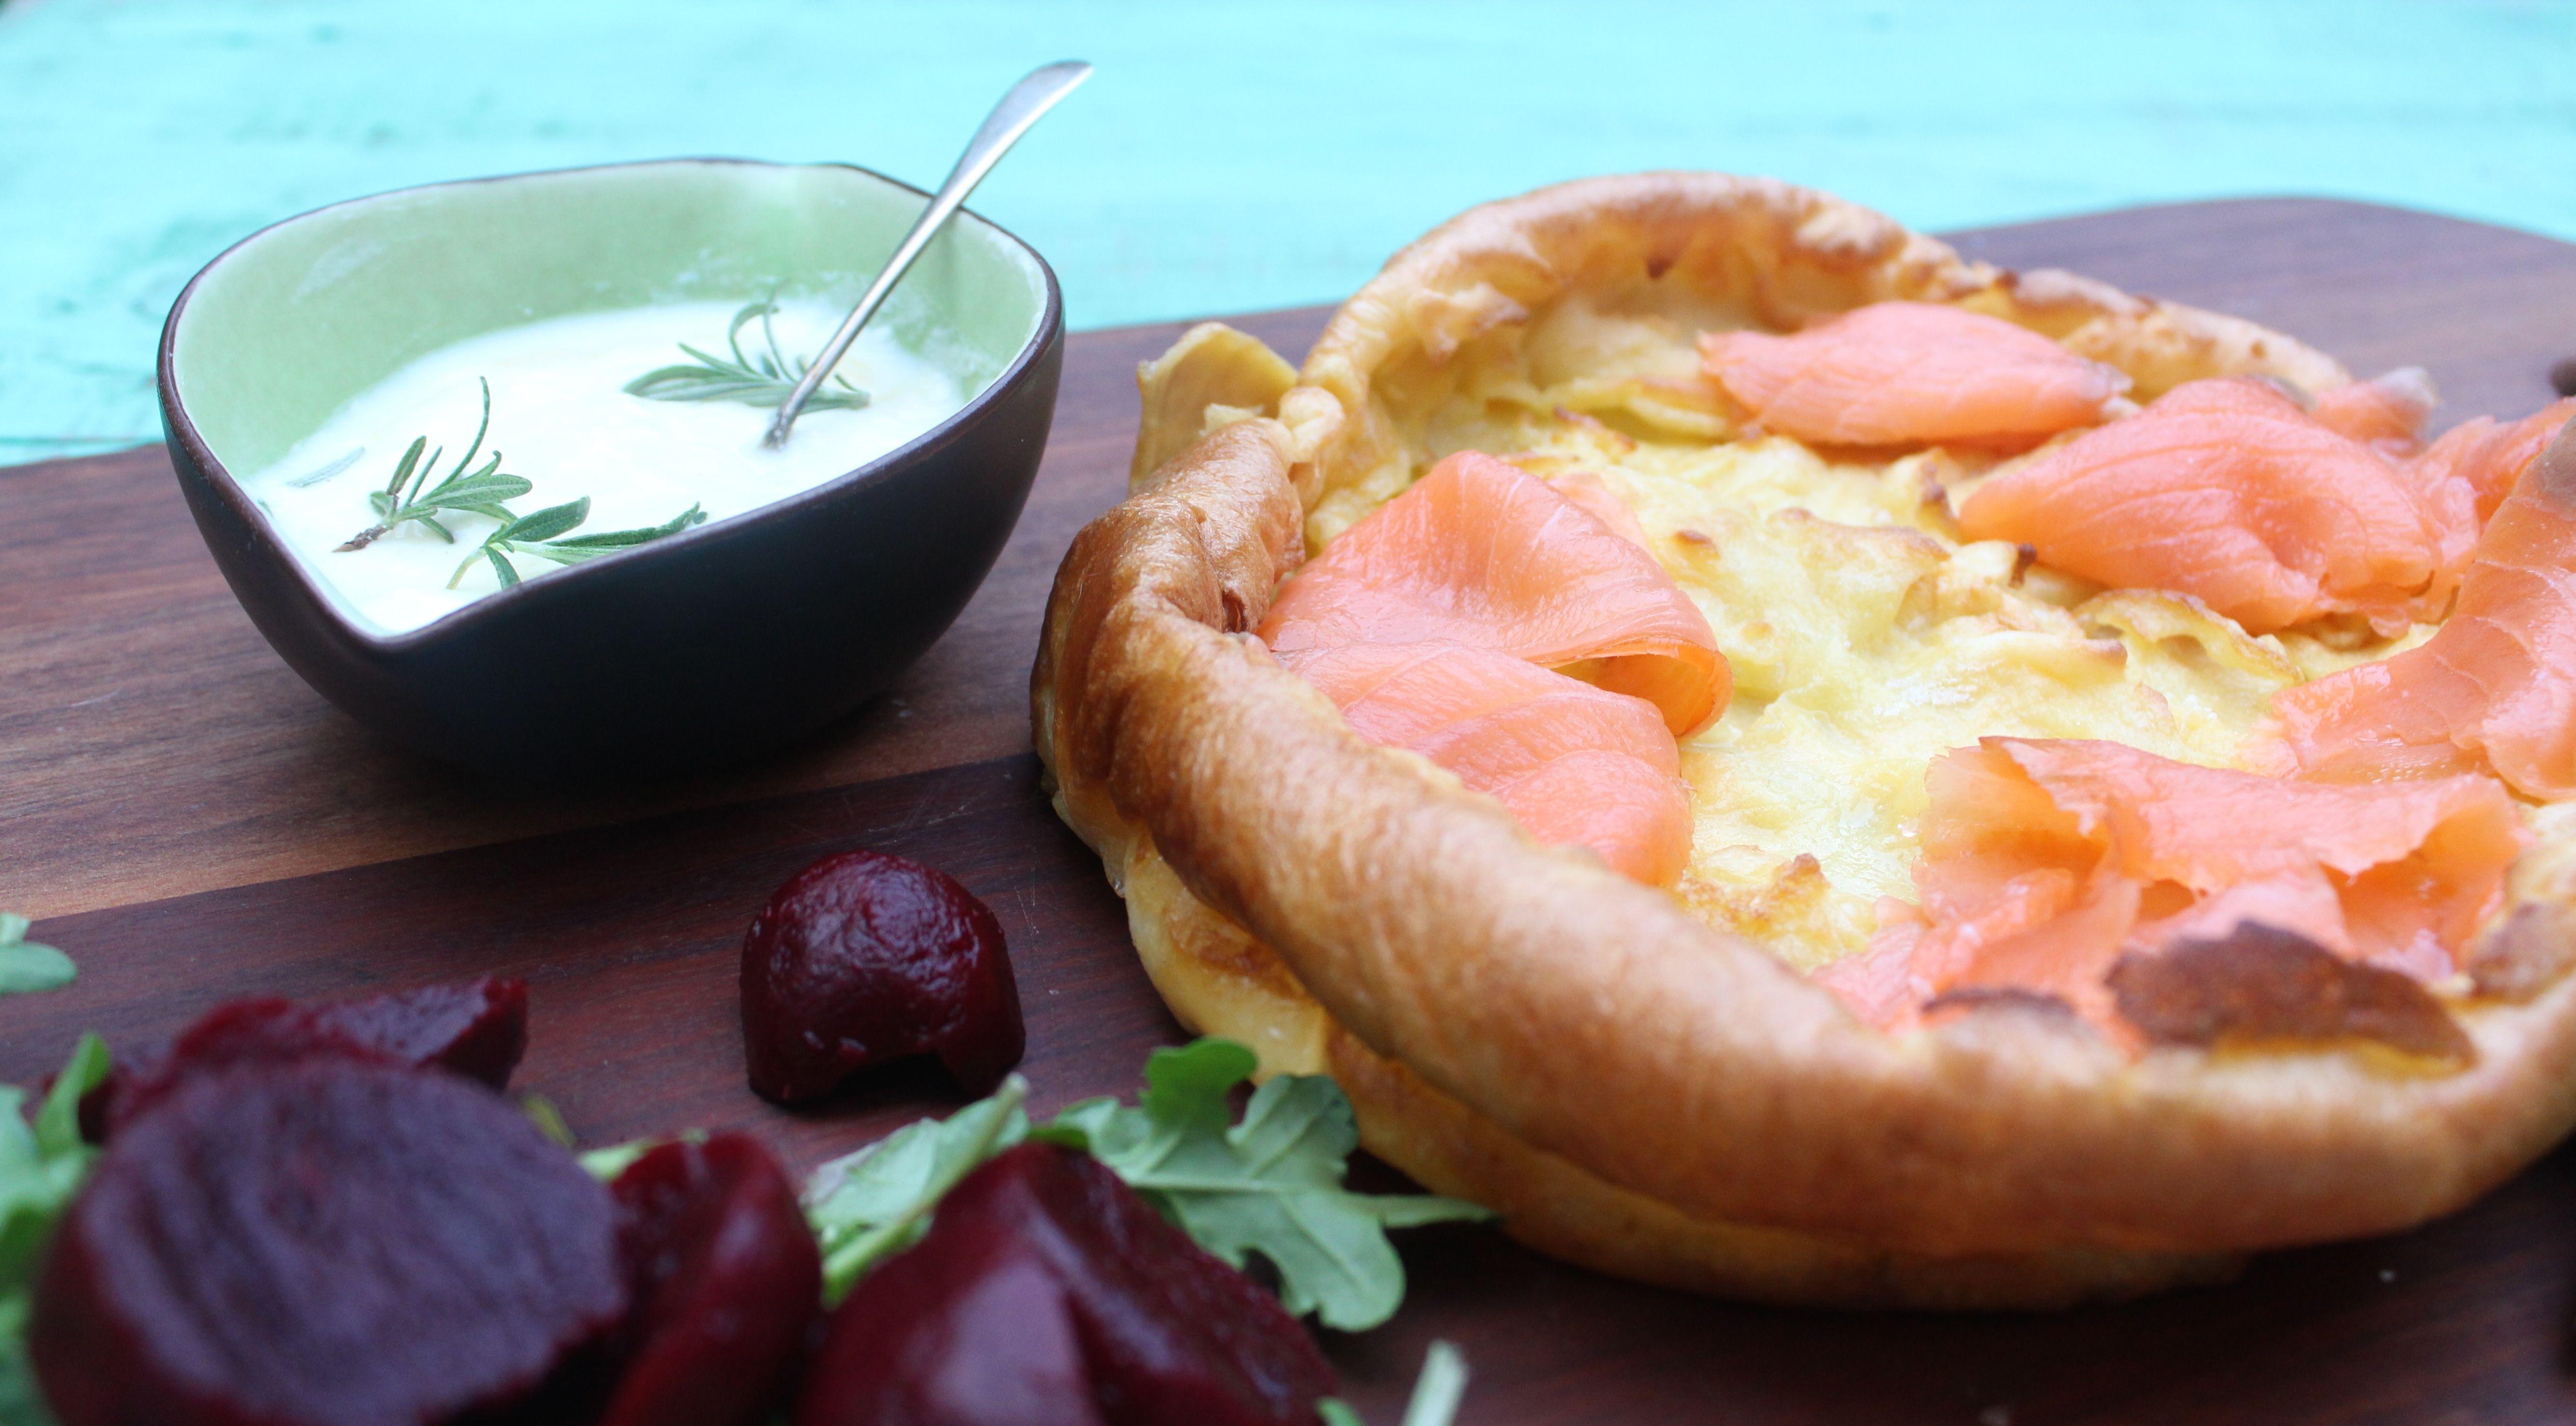 Leichte Sommerküche Jamie Oliver : Jamies min küche super food family classics amazon de jamie